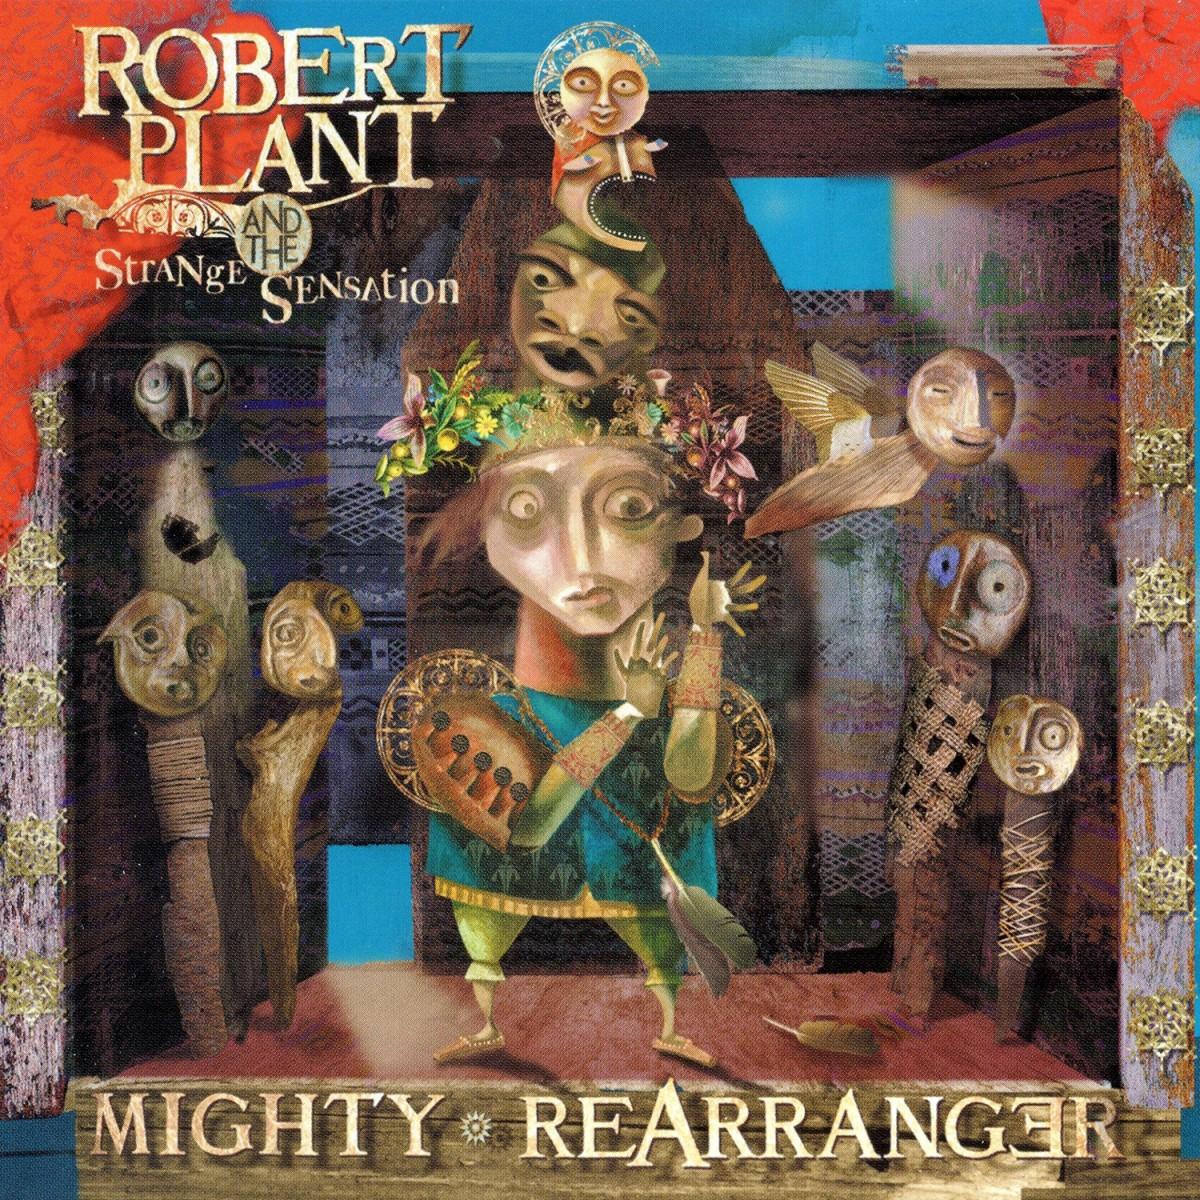 Plant, Robert and the Strange Sensation: Mighty Rearranger (2005)